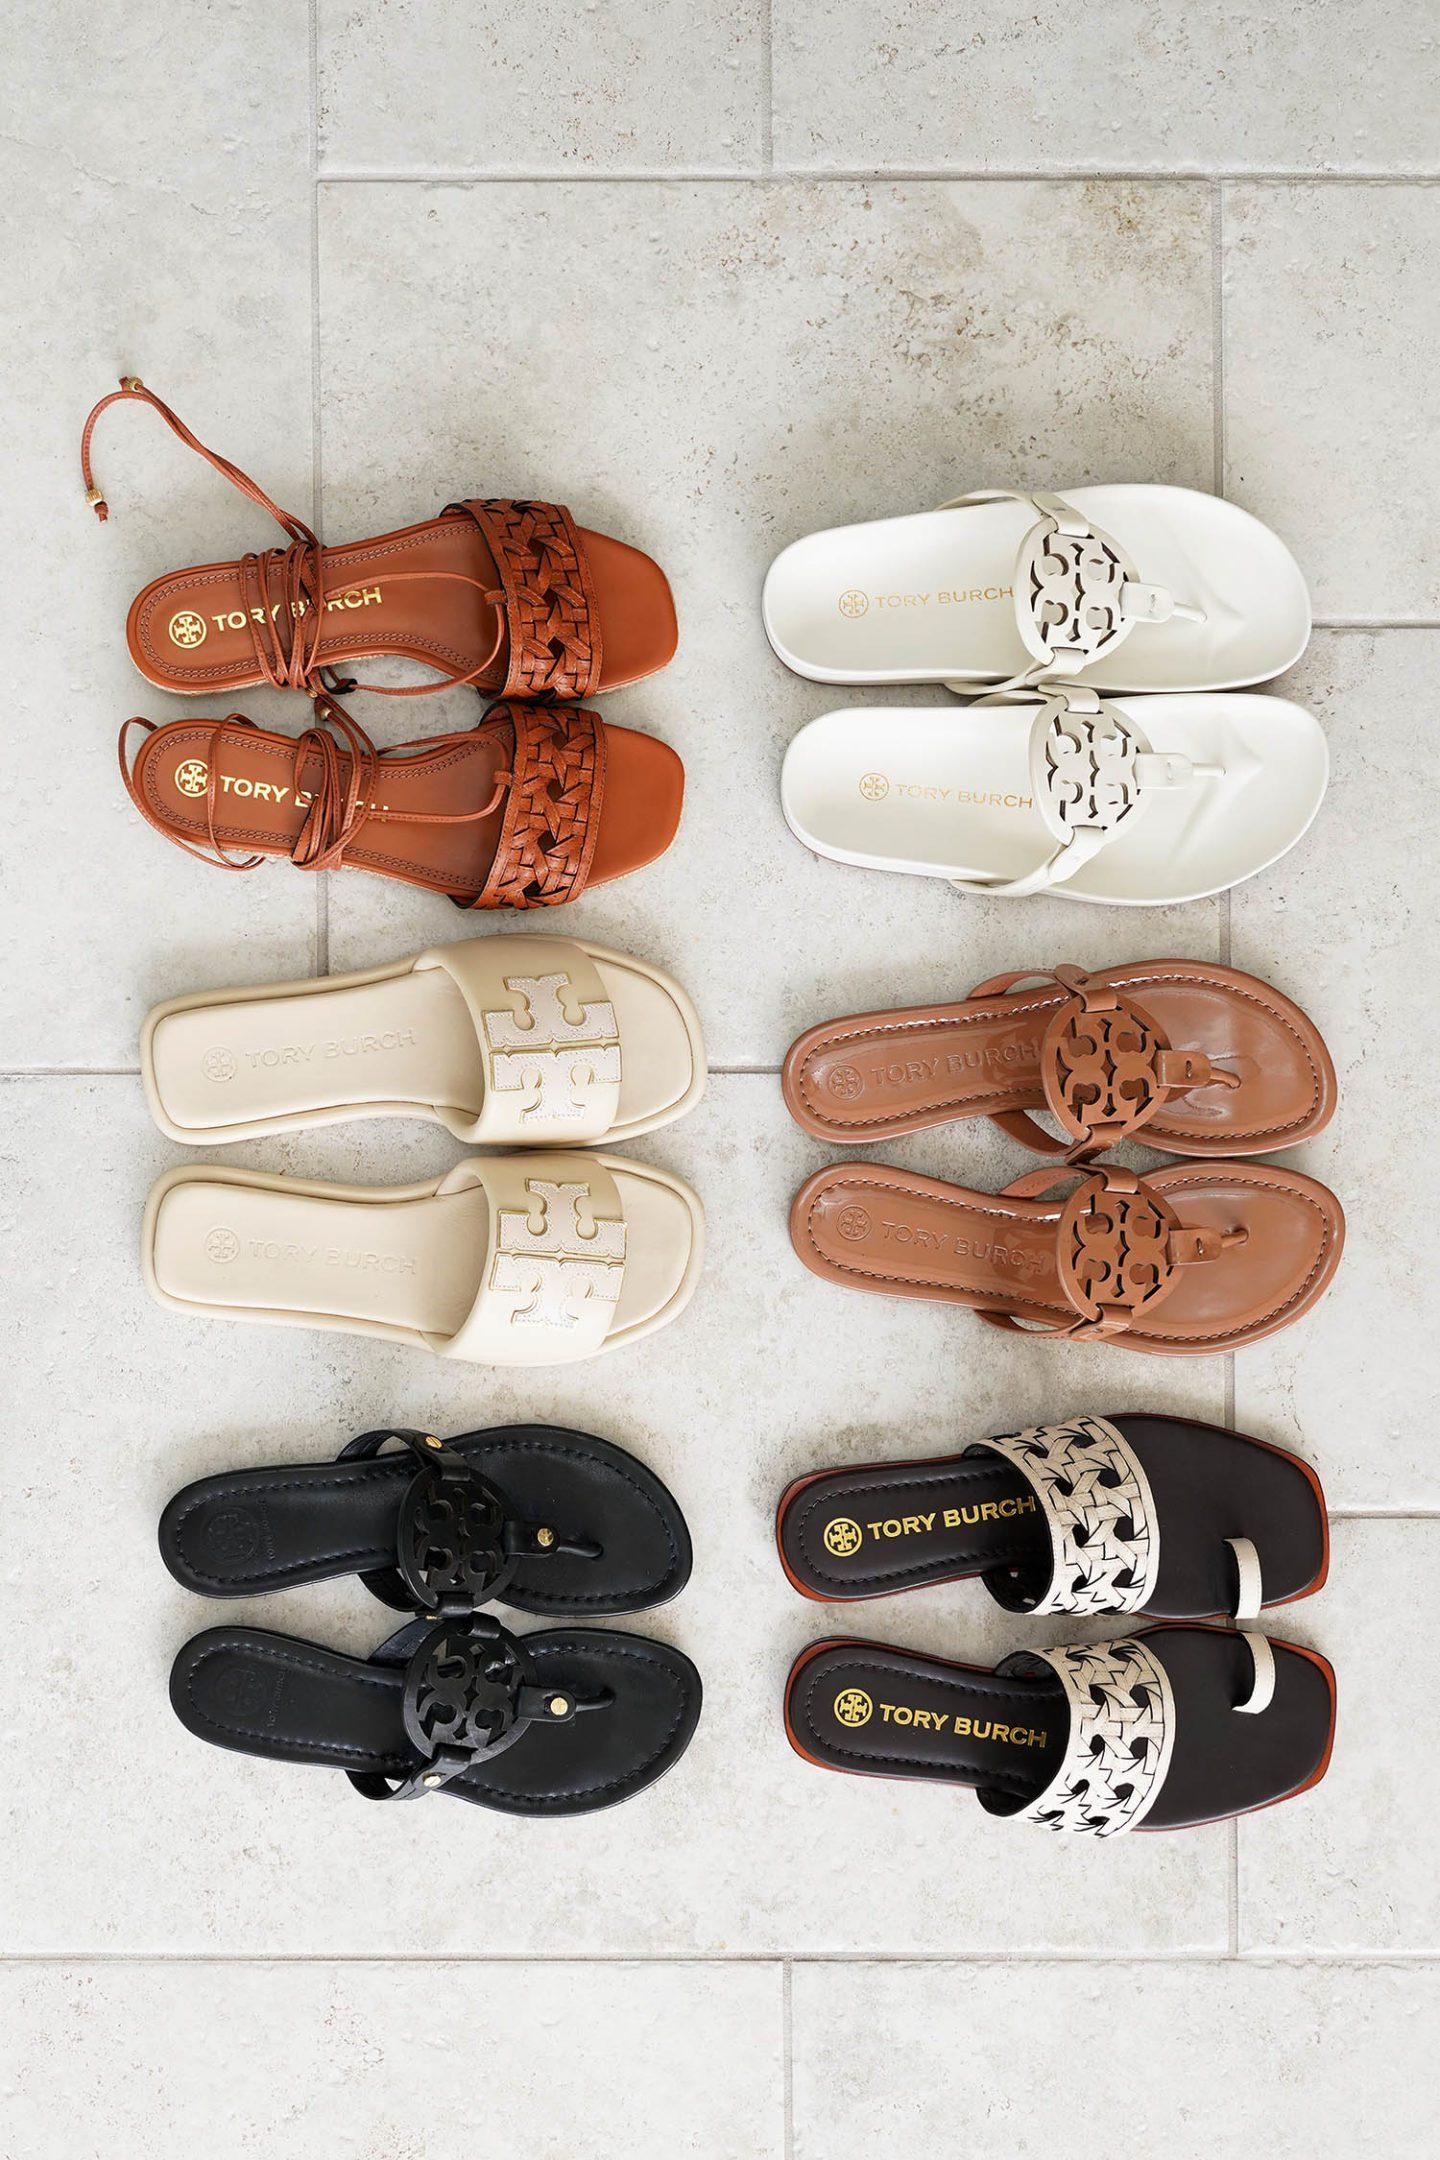 Best Tory Burch Sandals | The Beauty Lookbook